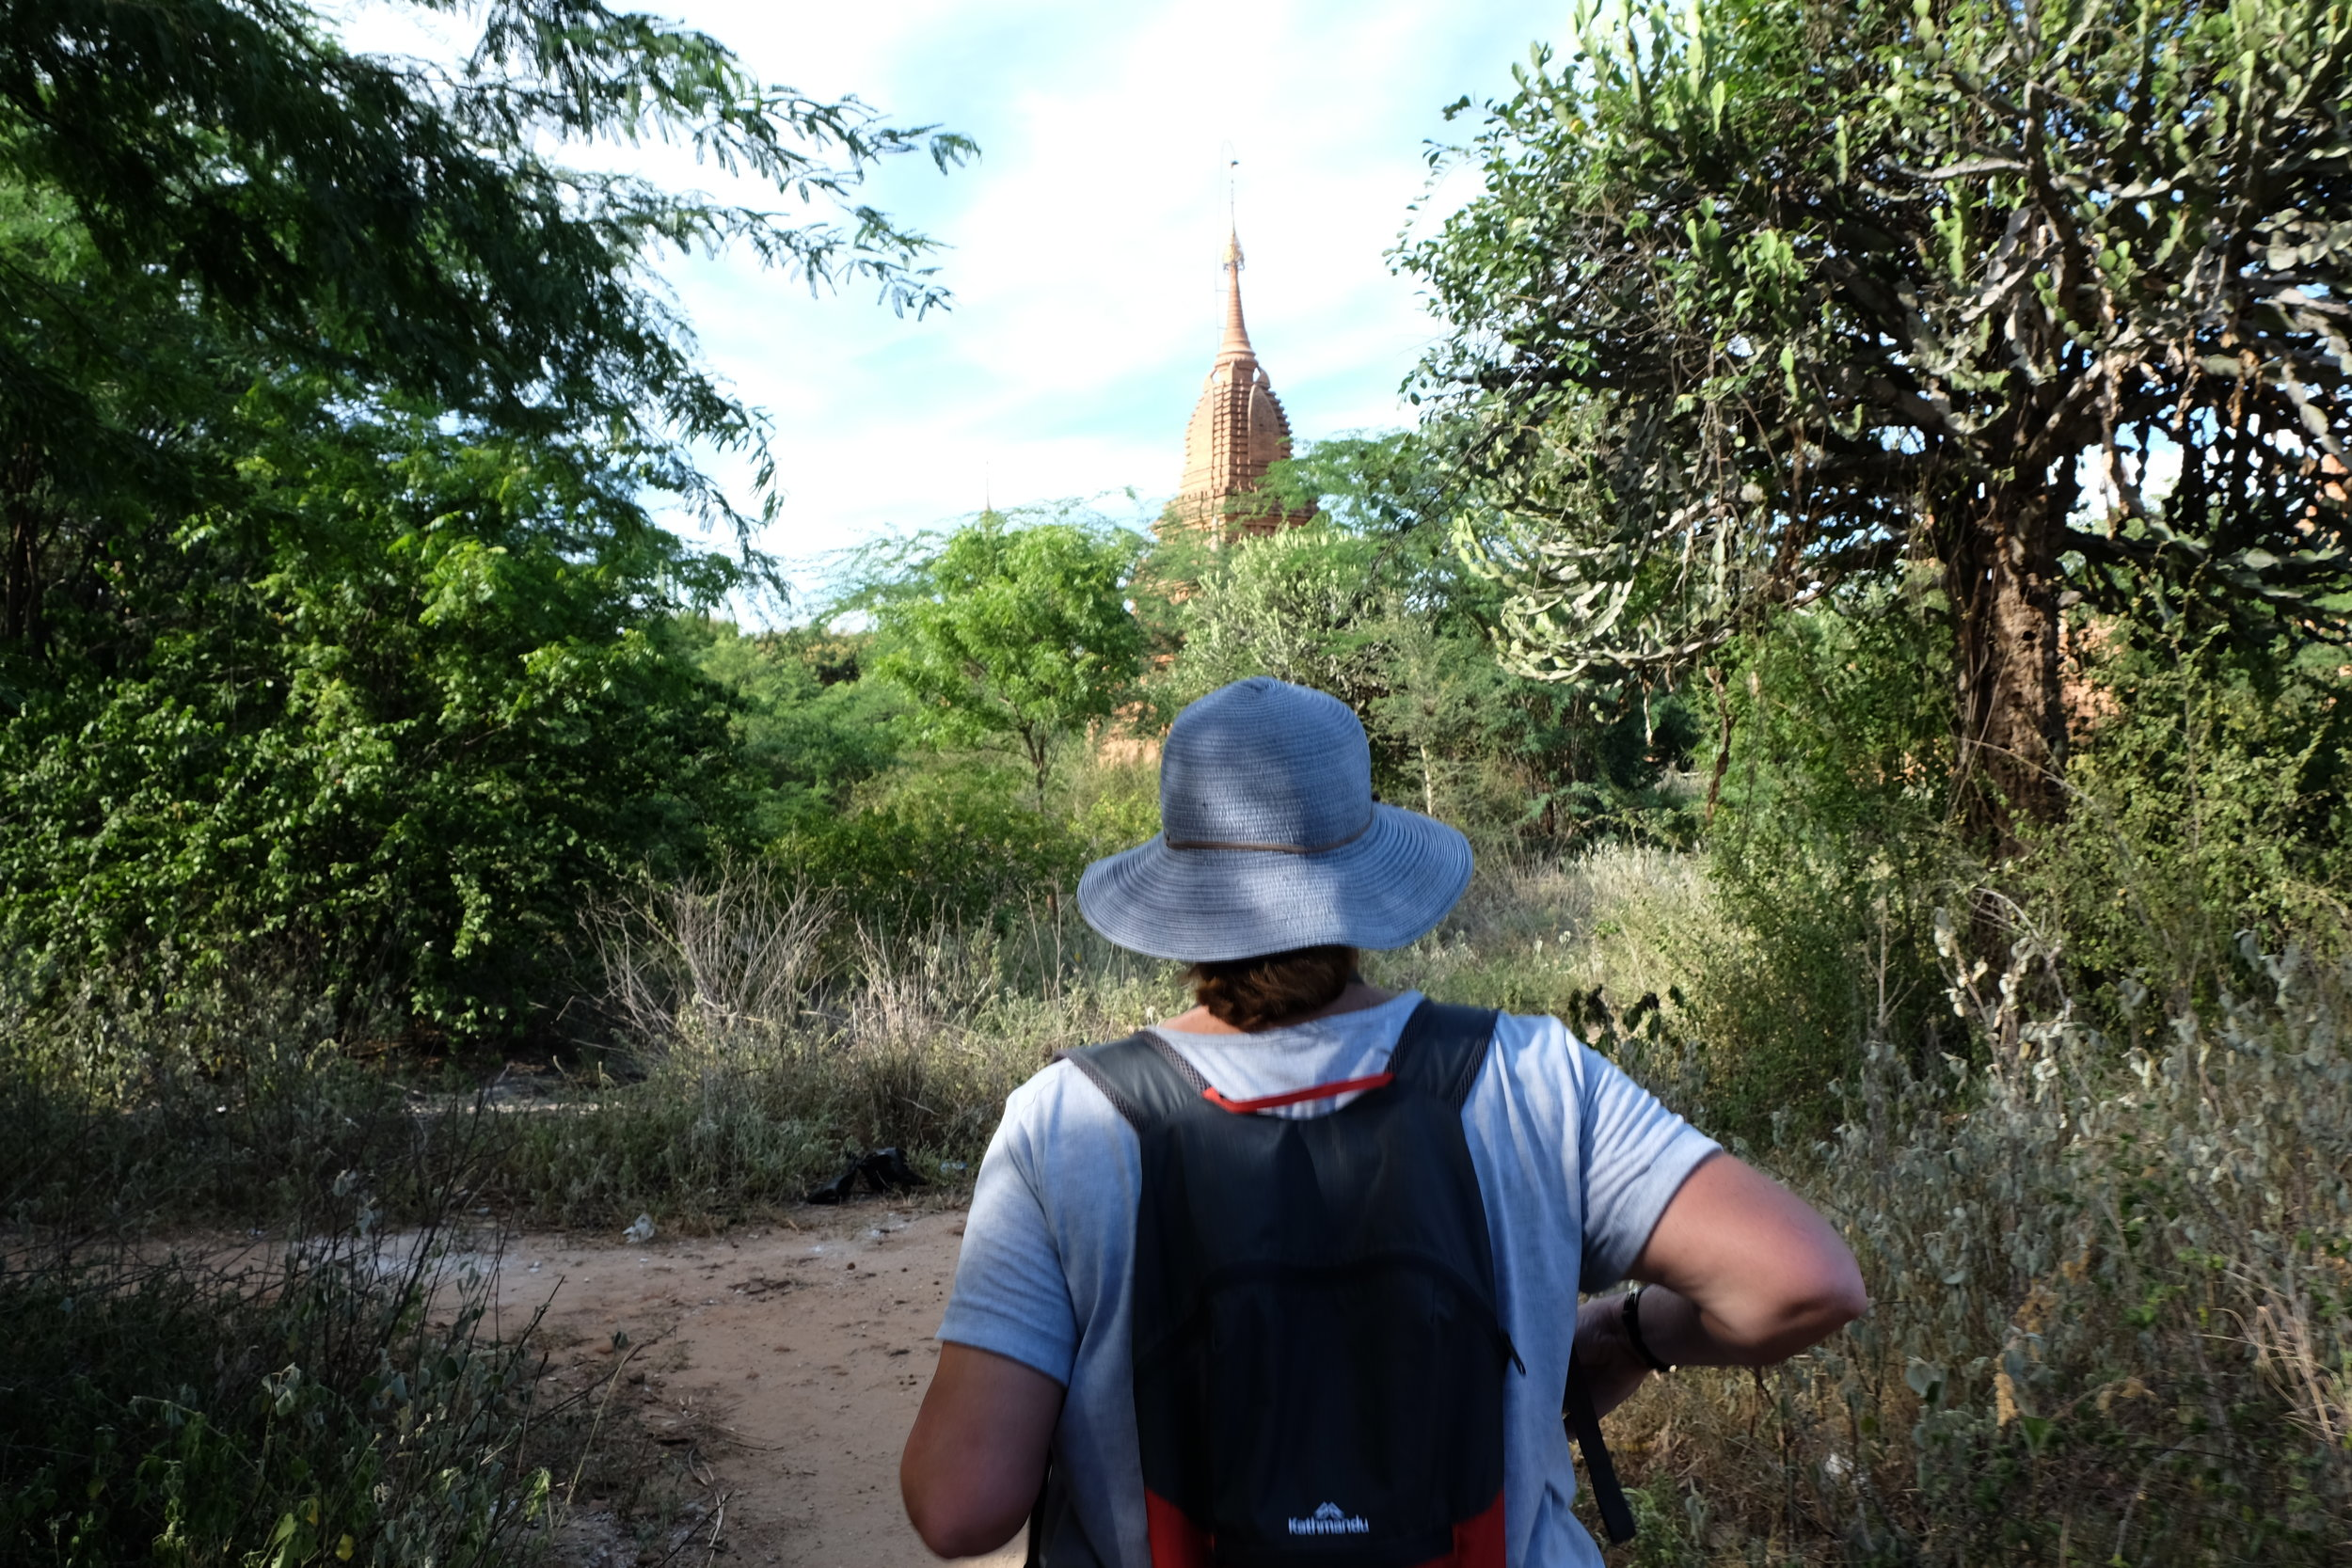 Liz the explorer discovers a stupa